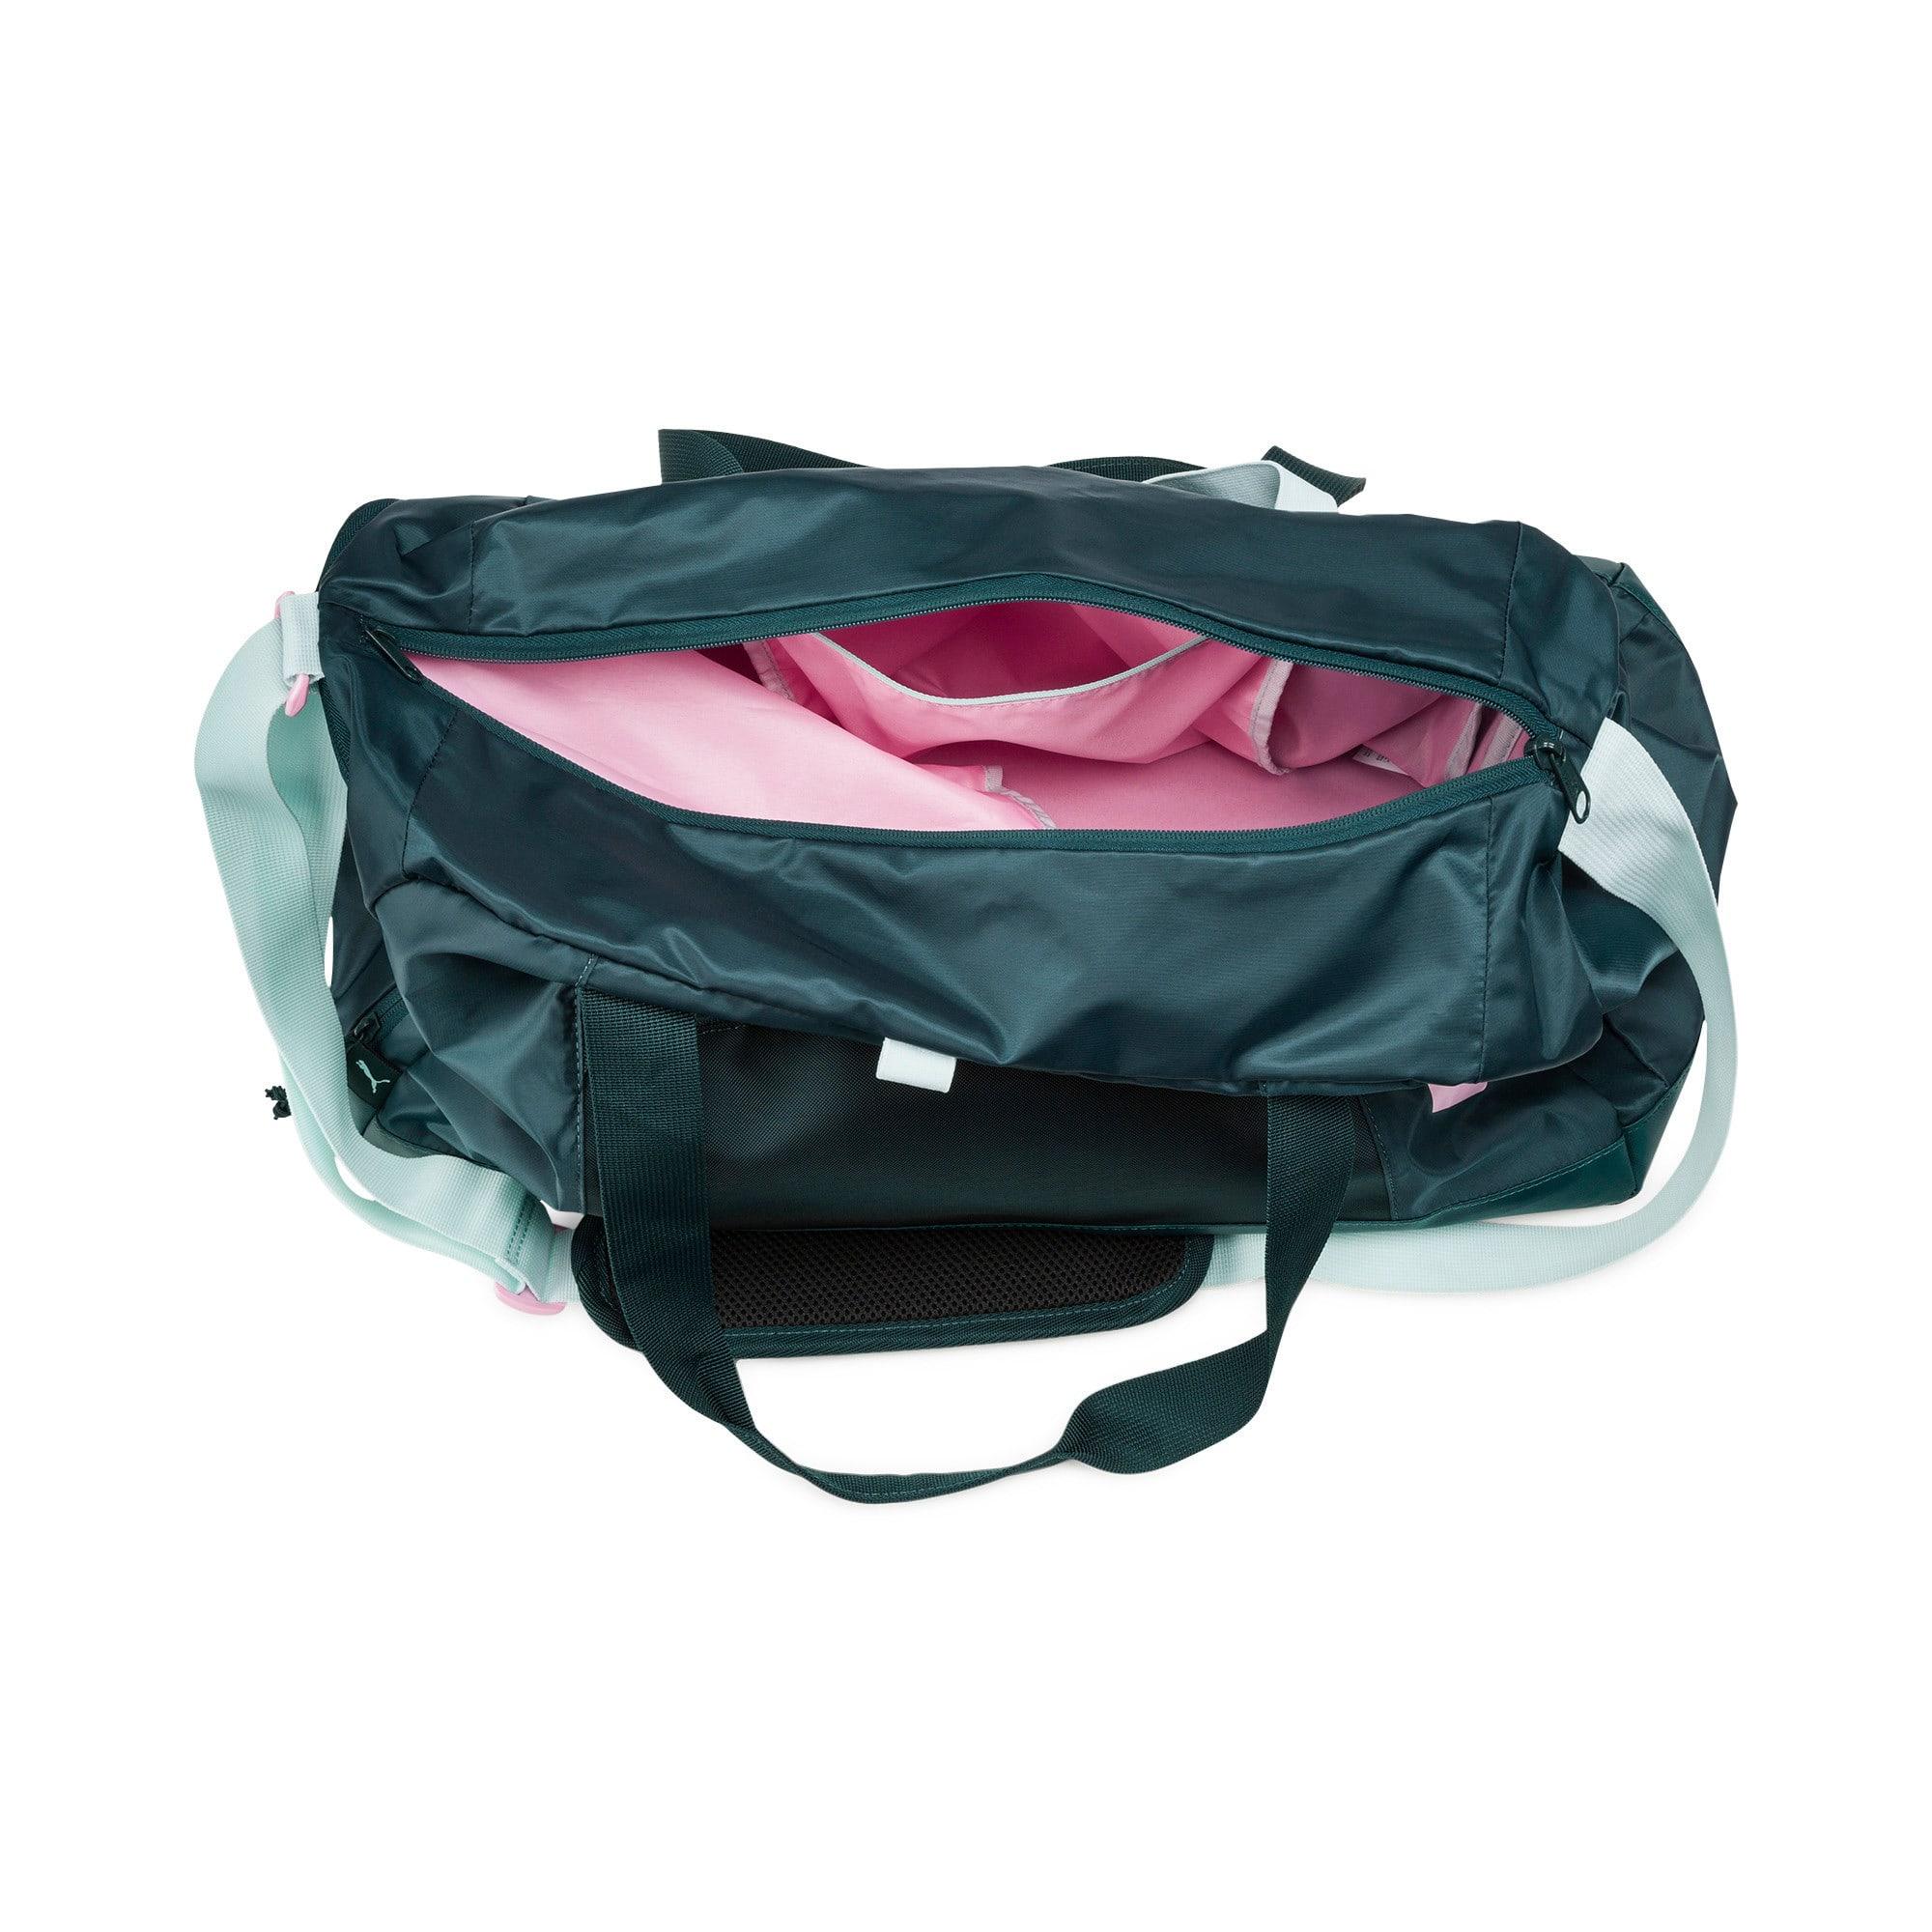 Thumbnail 4 of Active Training Duffel Bag, Ponderosa Pine, medium